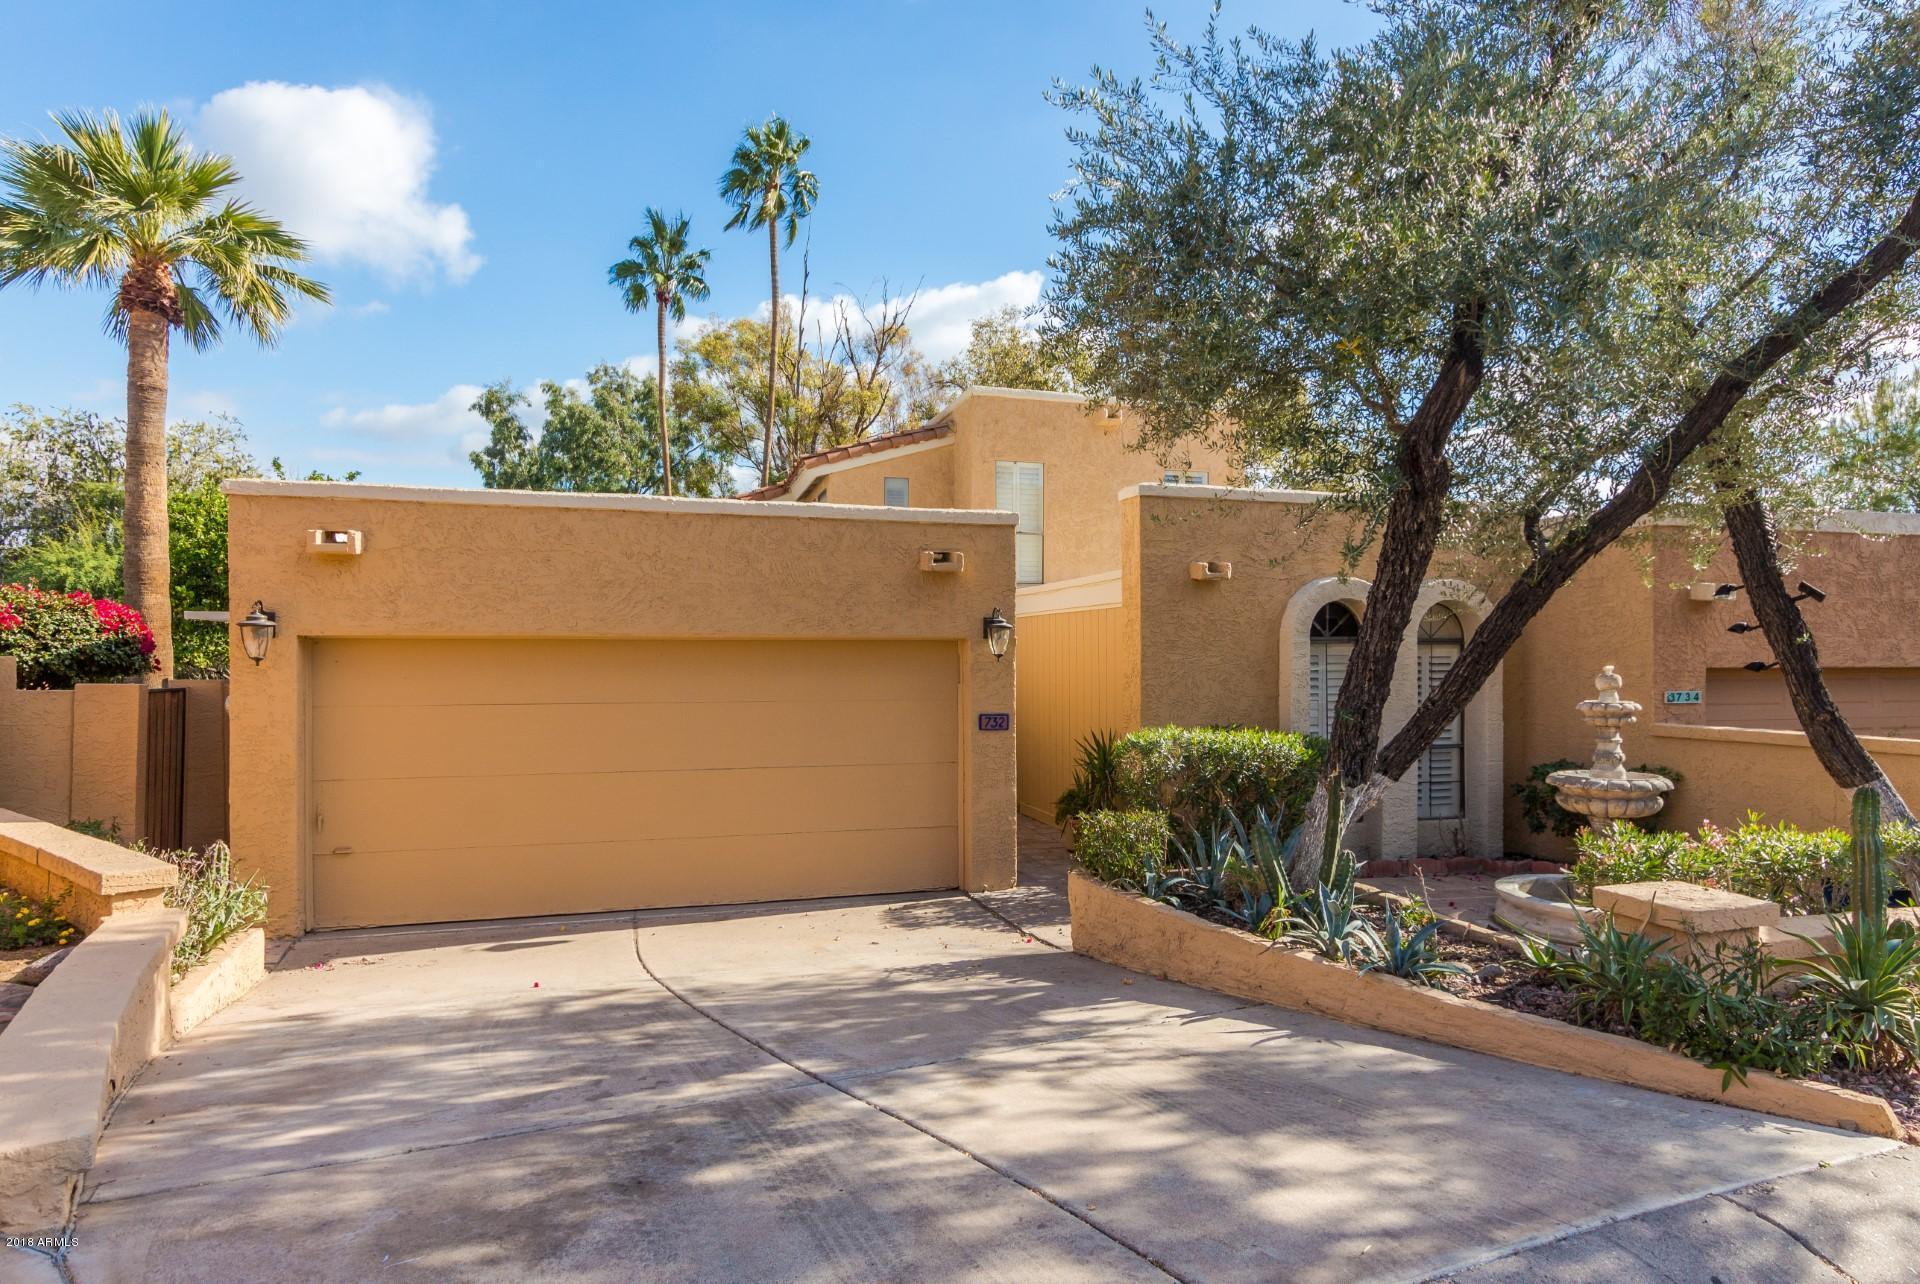 Photo of 732 E PEORIA Avenue, Phoenix, AZ 85020